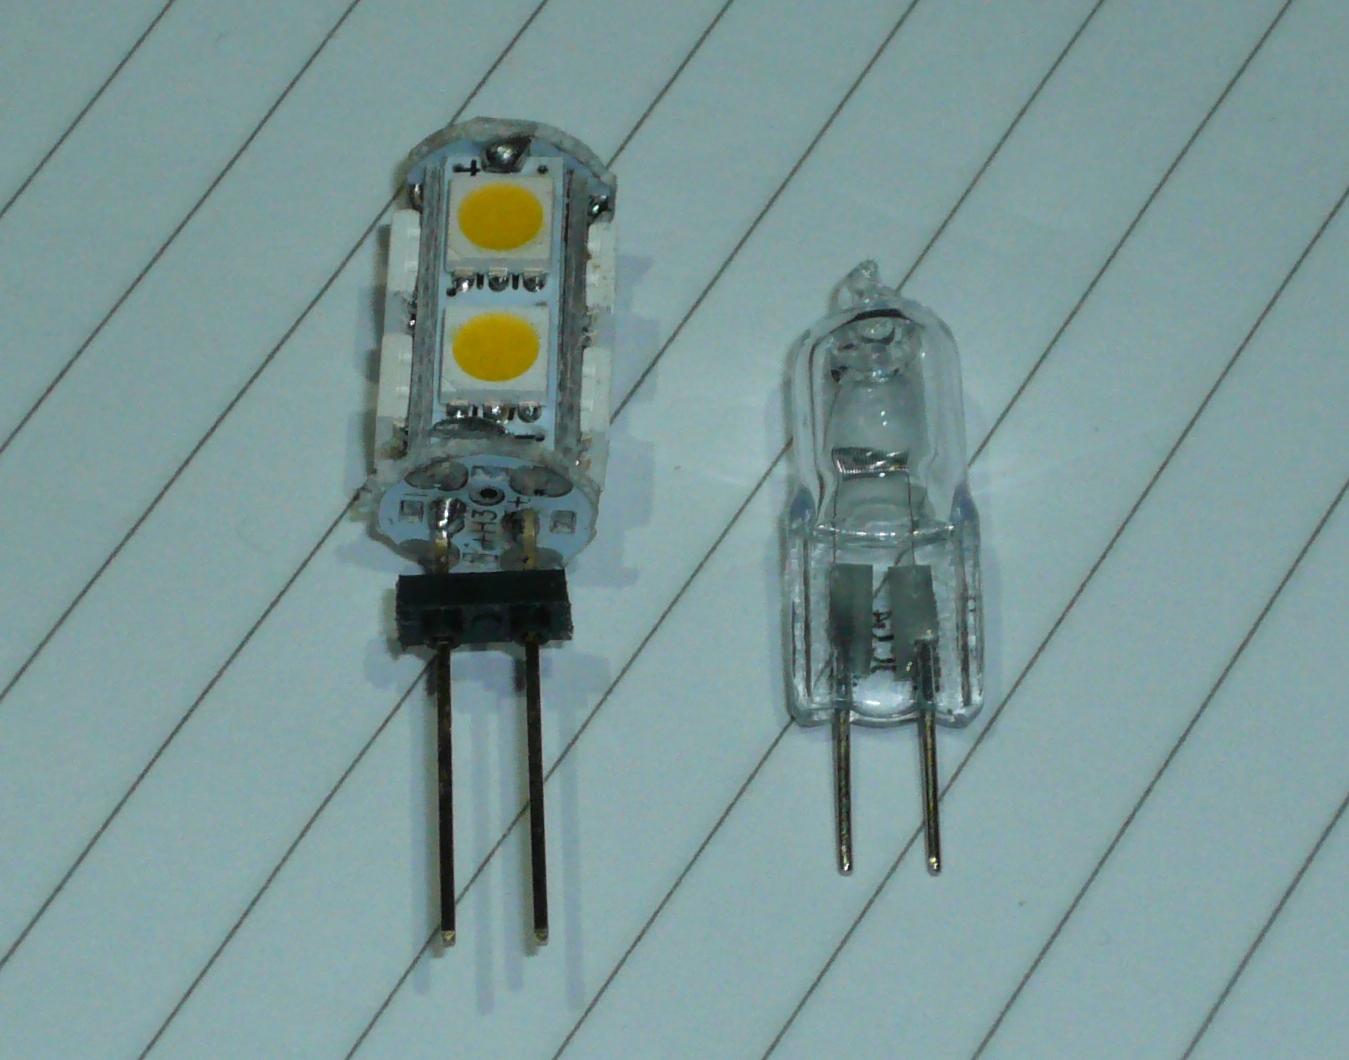 Led Halogen Bulb Diagram Wiring For A Tekonsha Trailer Brake Controller Making The Net Work Successfully Replacing